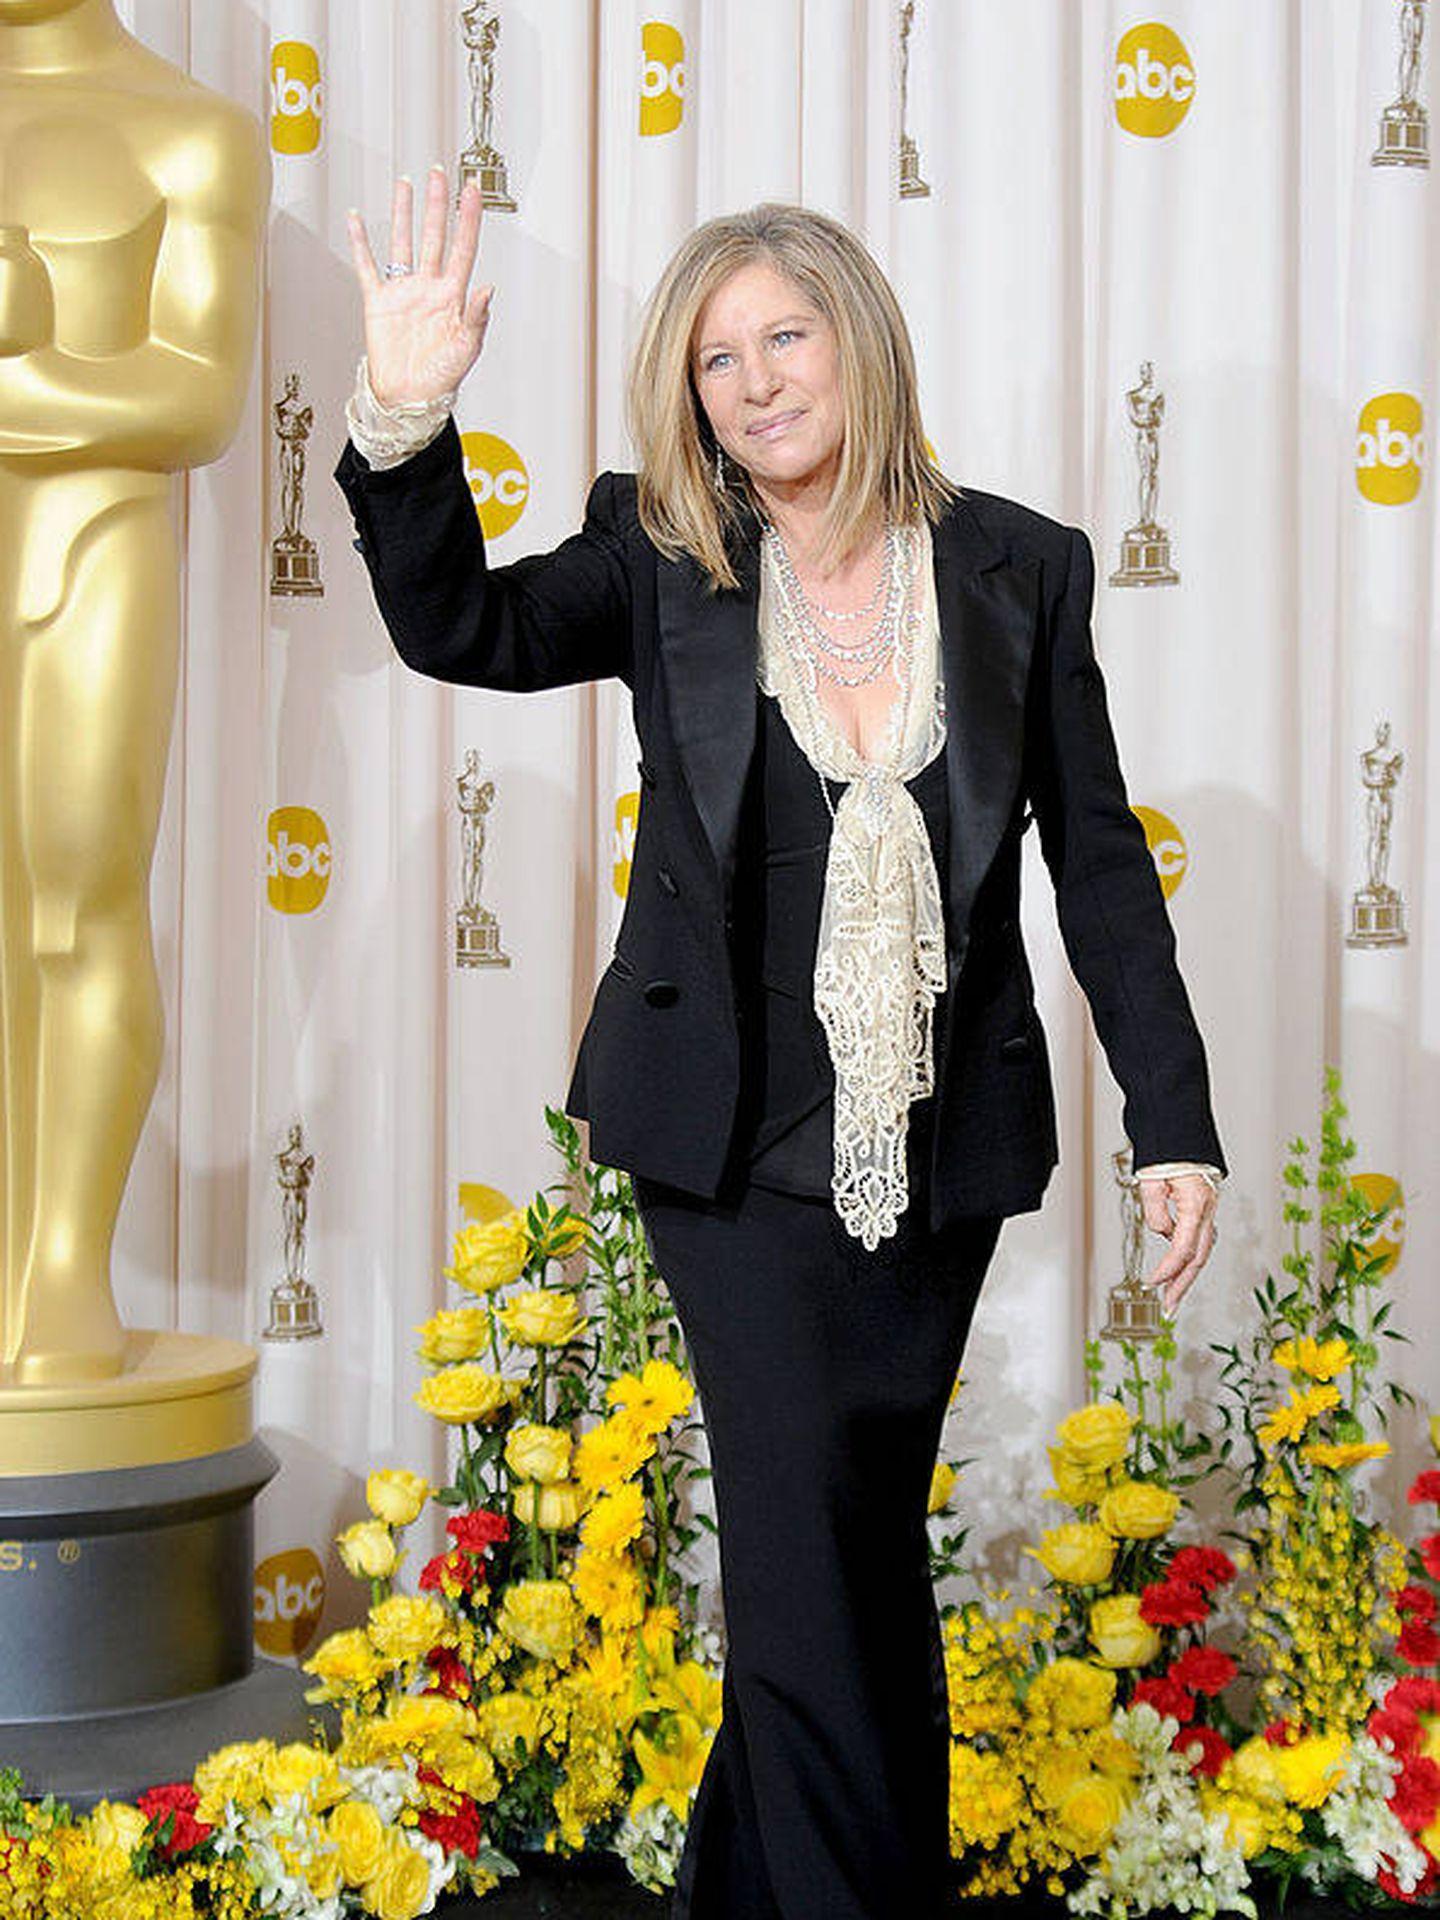 La cantante y actriz Barbra Streisand (Getty Images).